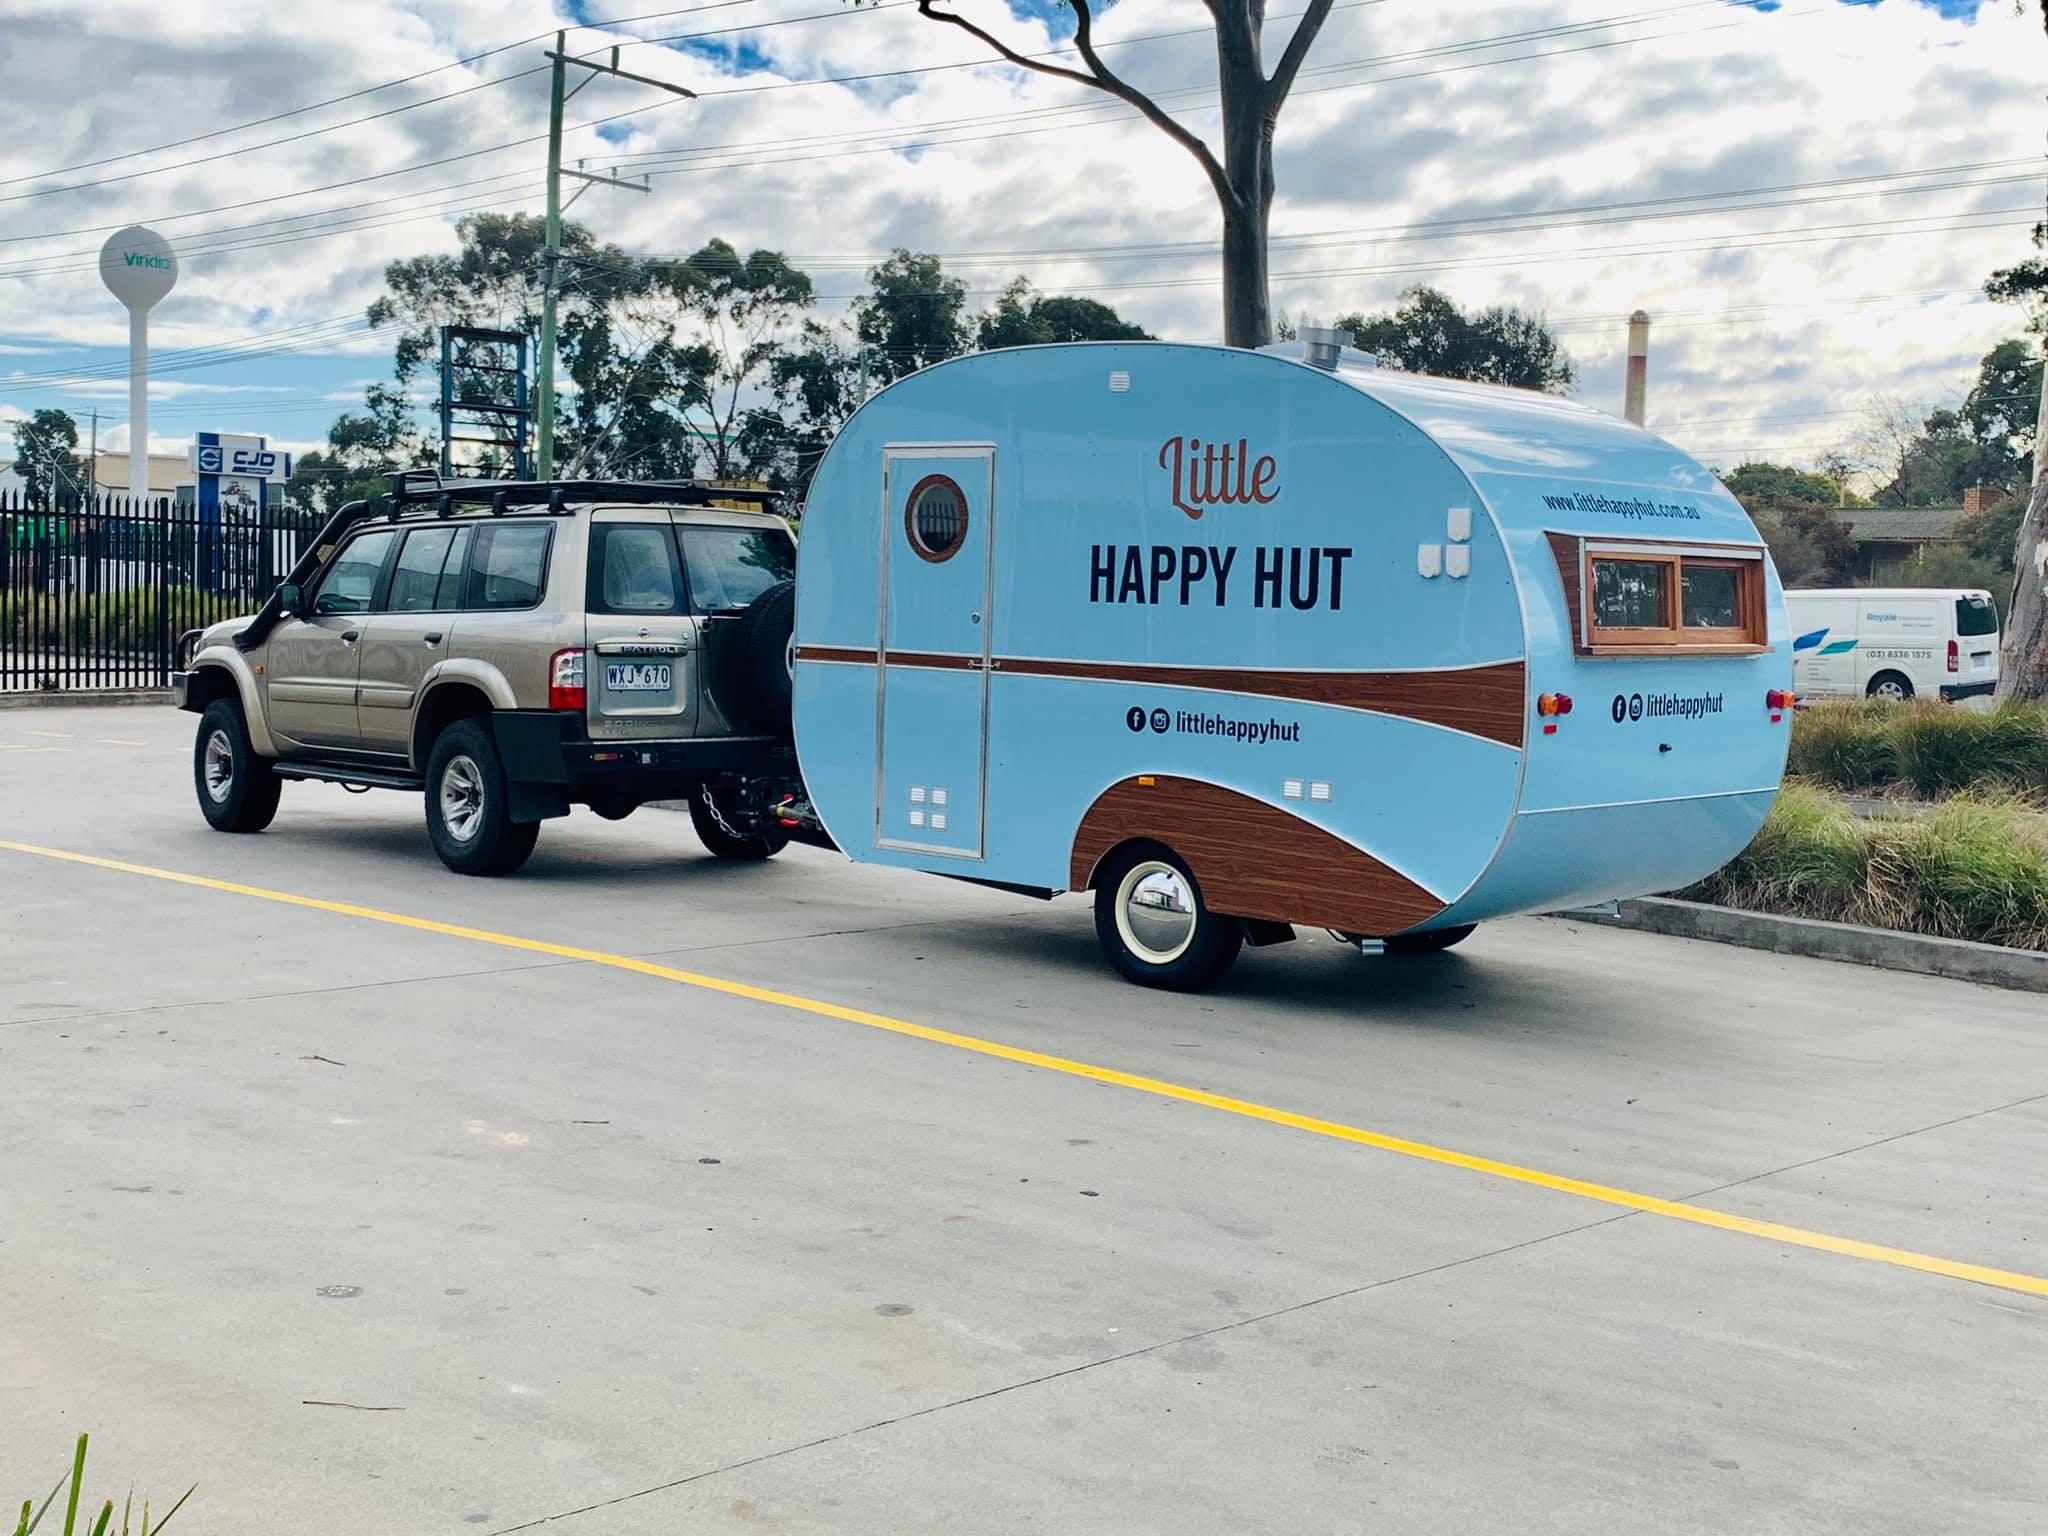 Little Happy Hut